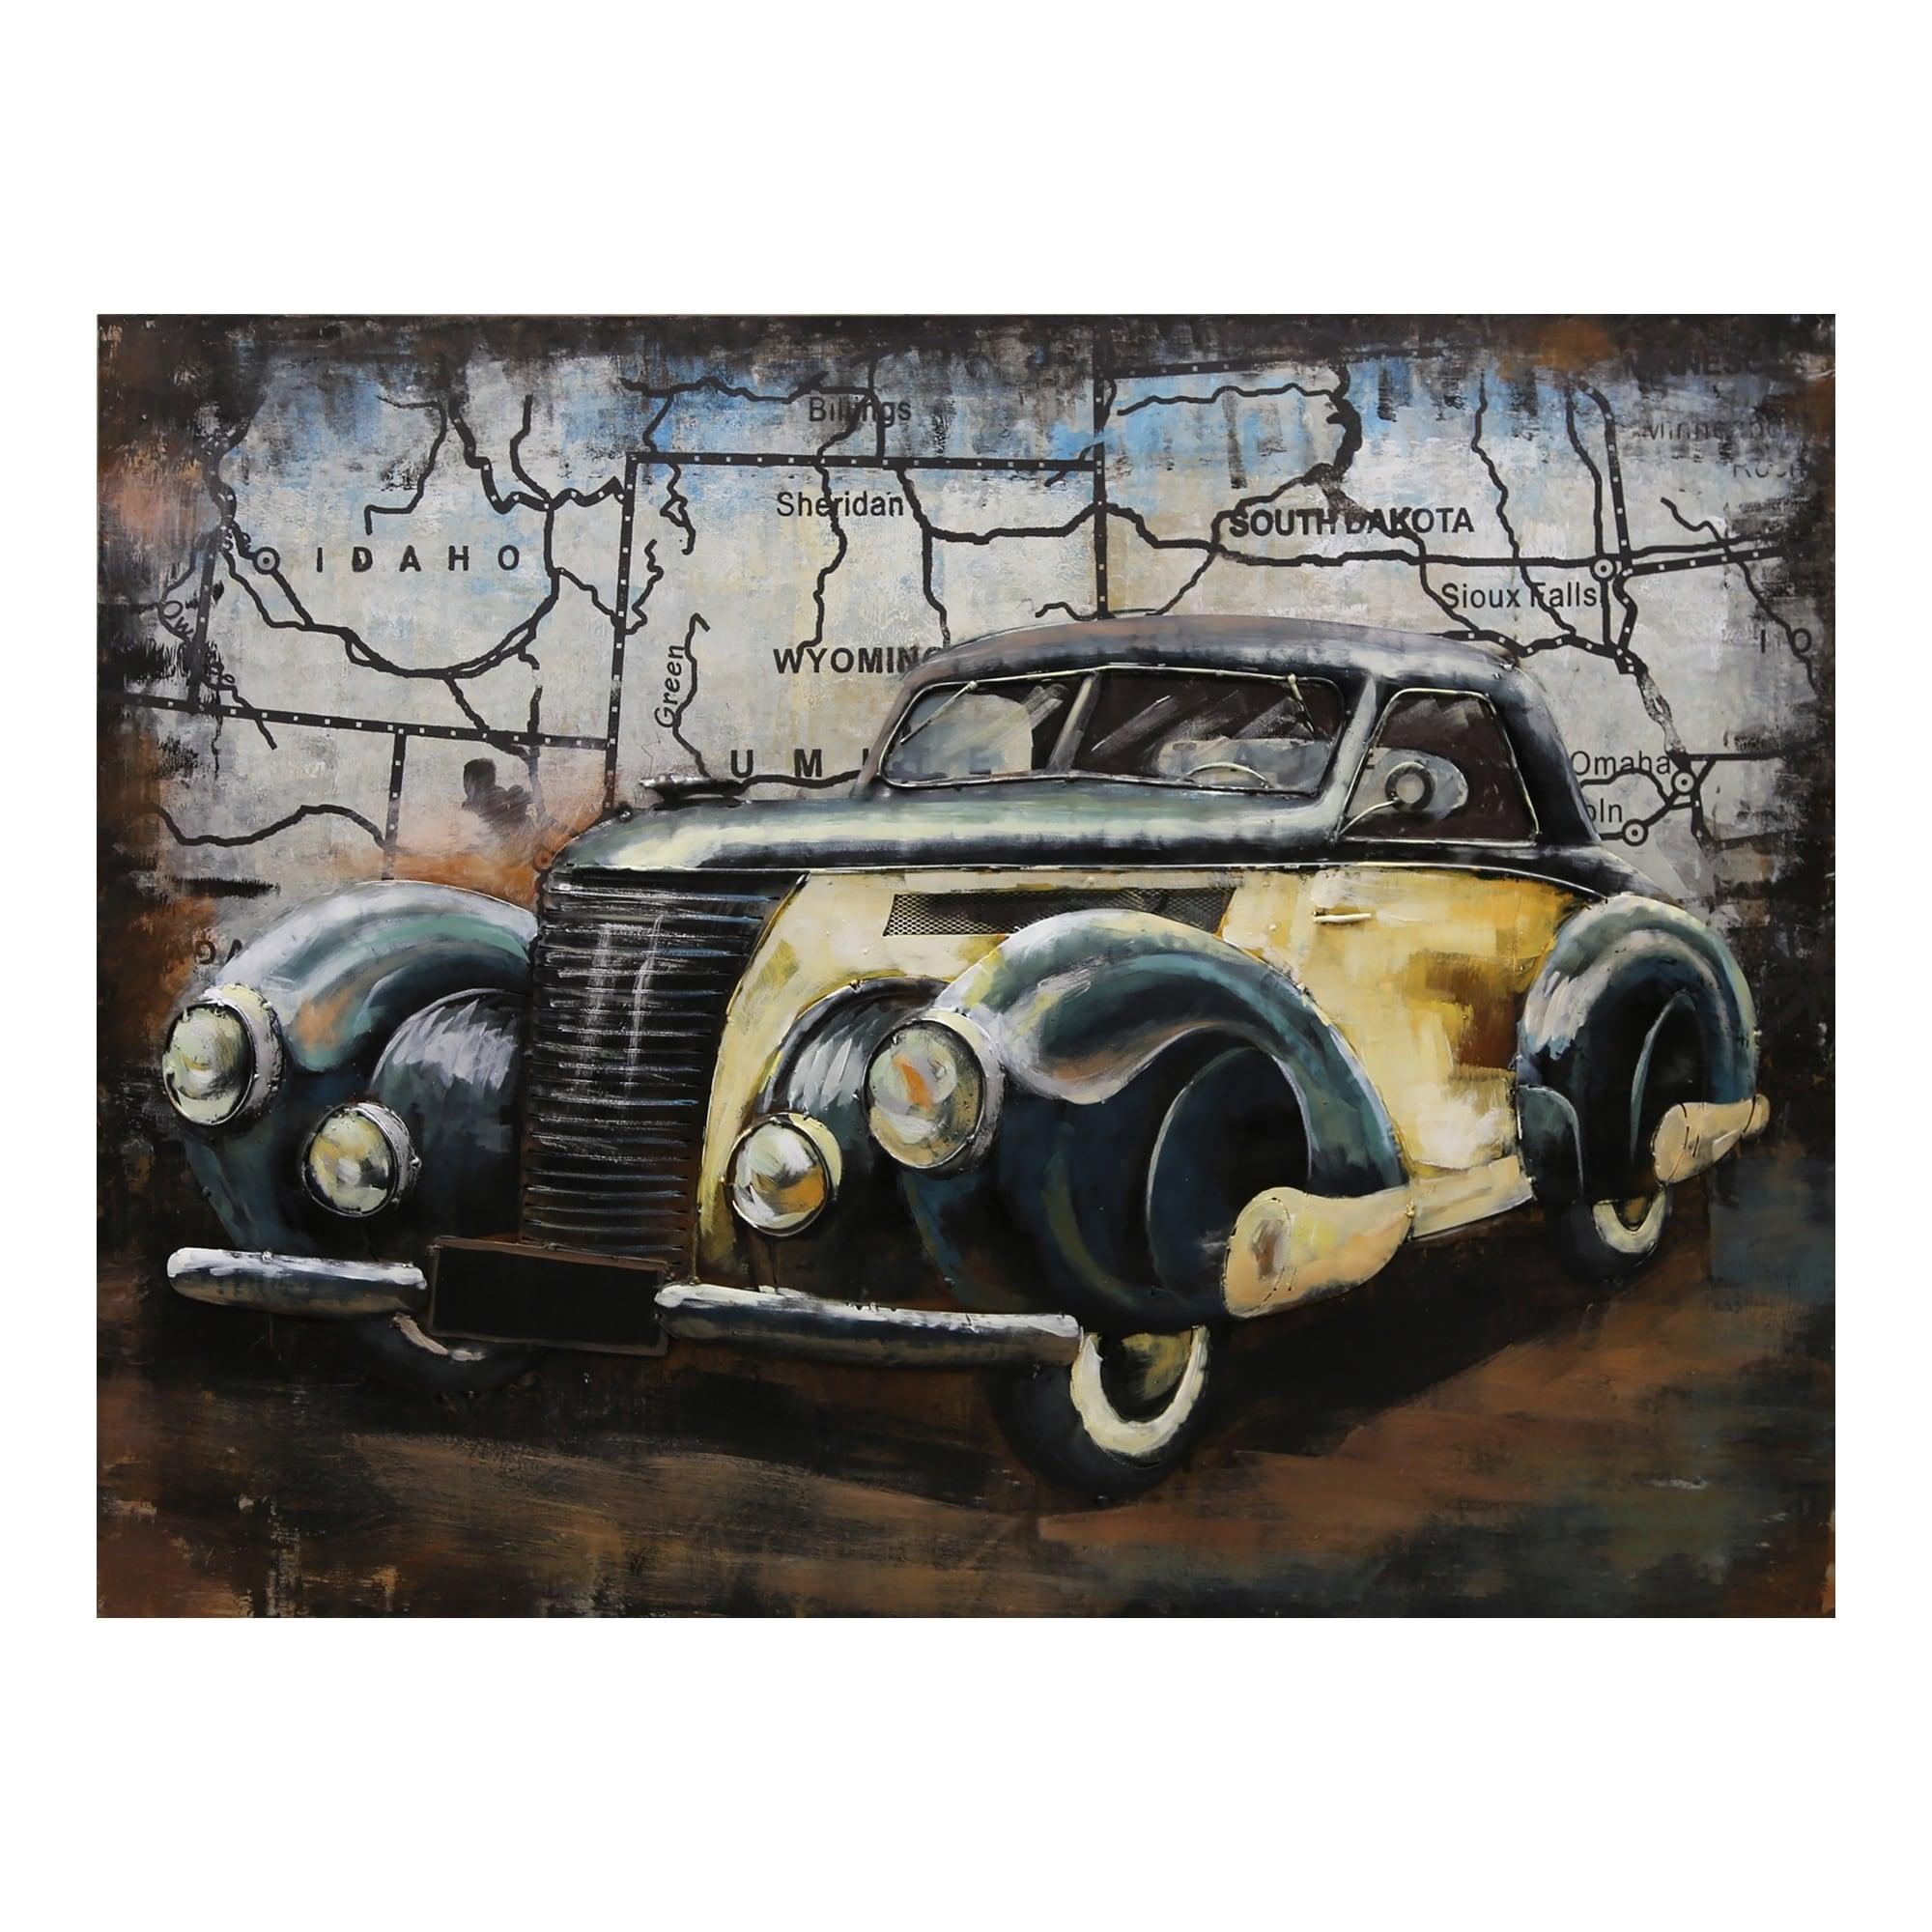 Aurelle Home Antique Metal Industrial Car Wall Decor - 40 x 30